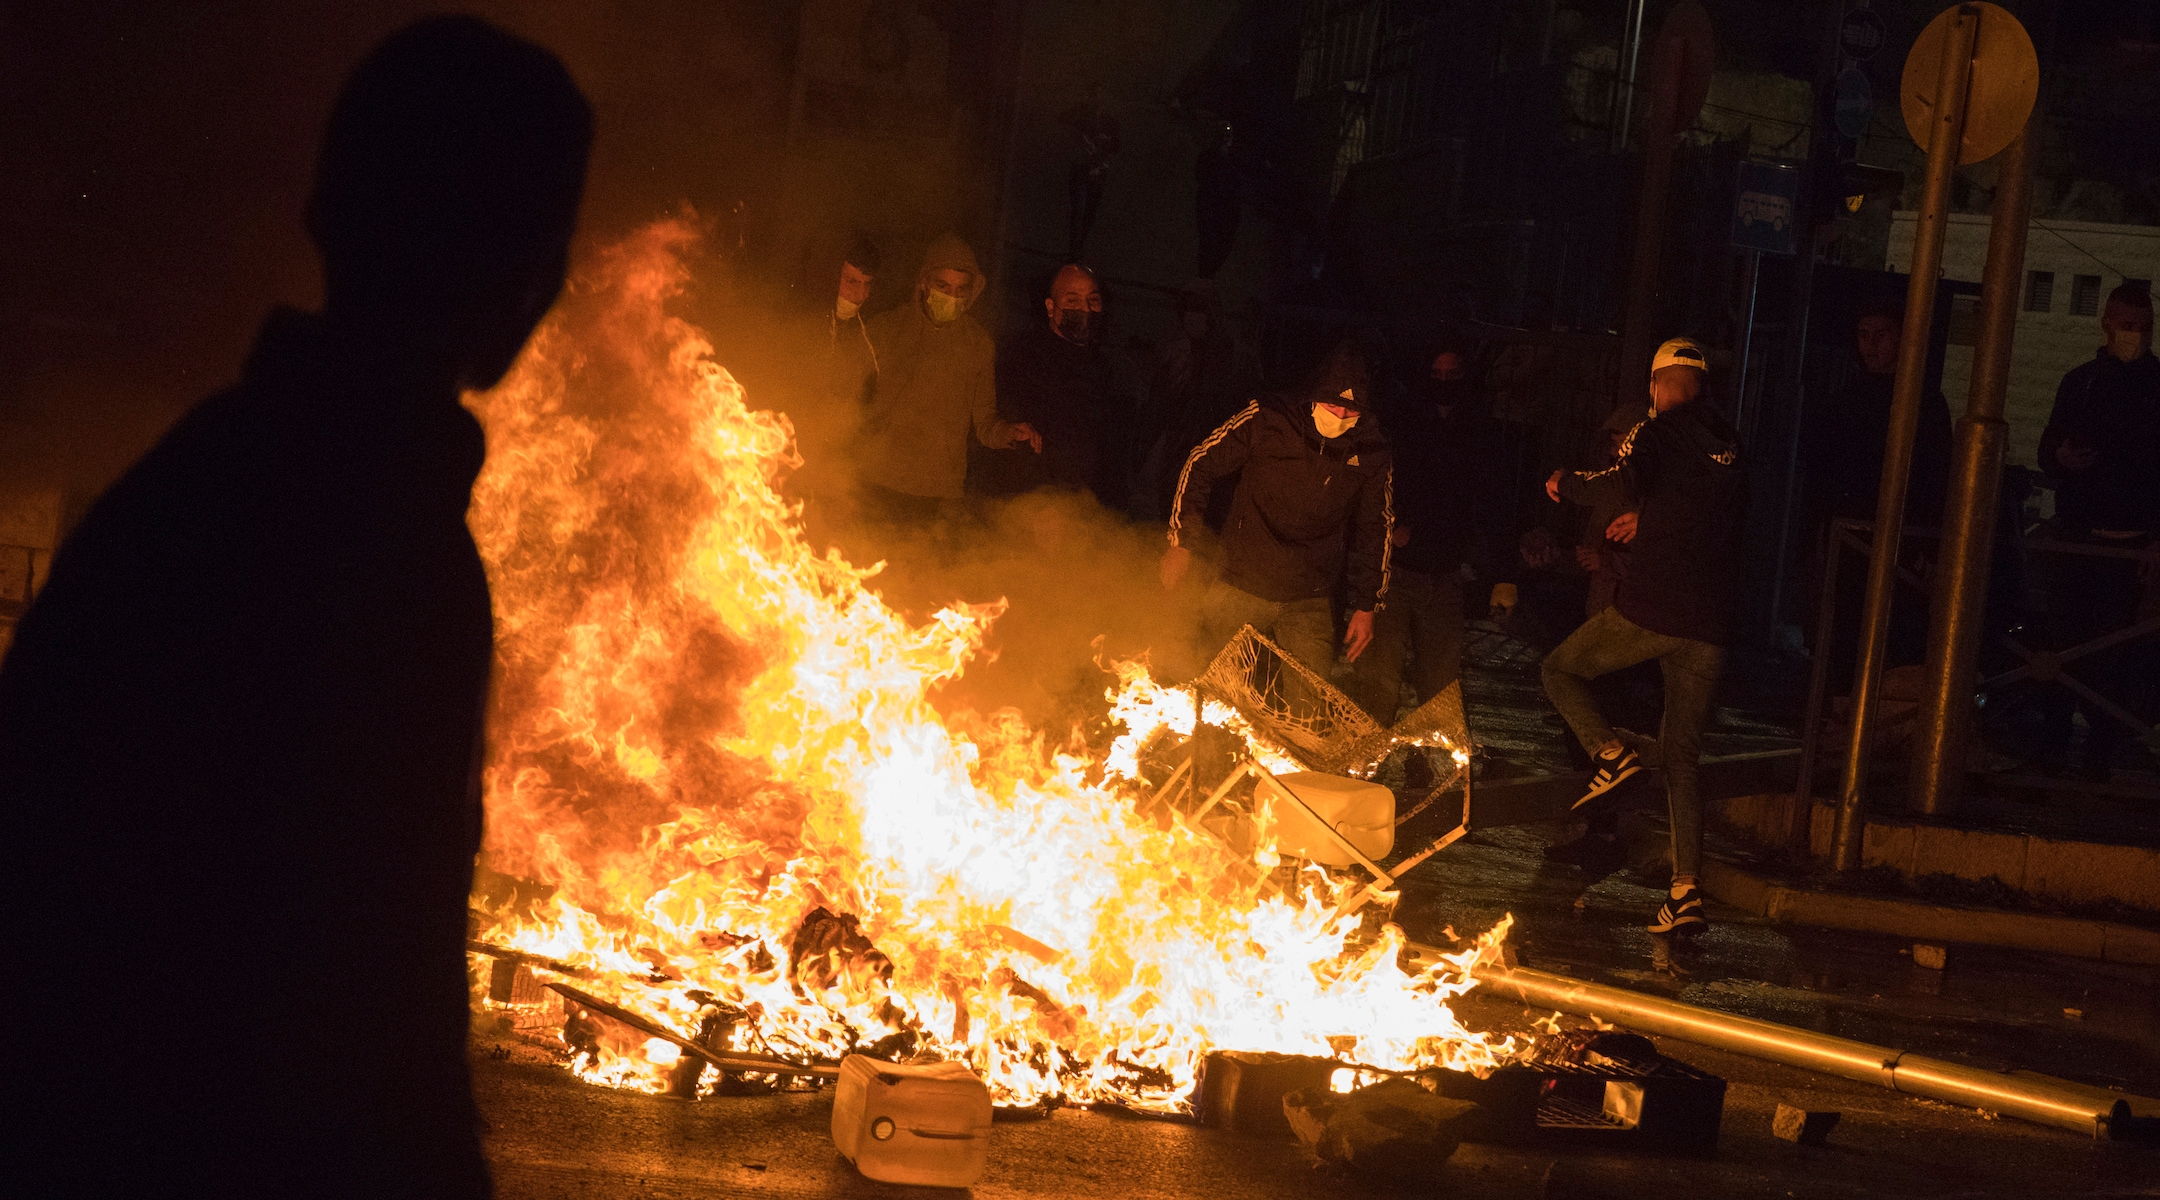 A fire burns amid violent protests in Jerusalem on April 22, 2021. (Olivier Fitoussi/Flash90)